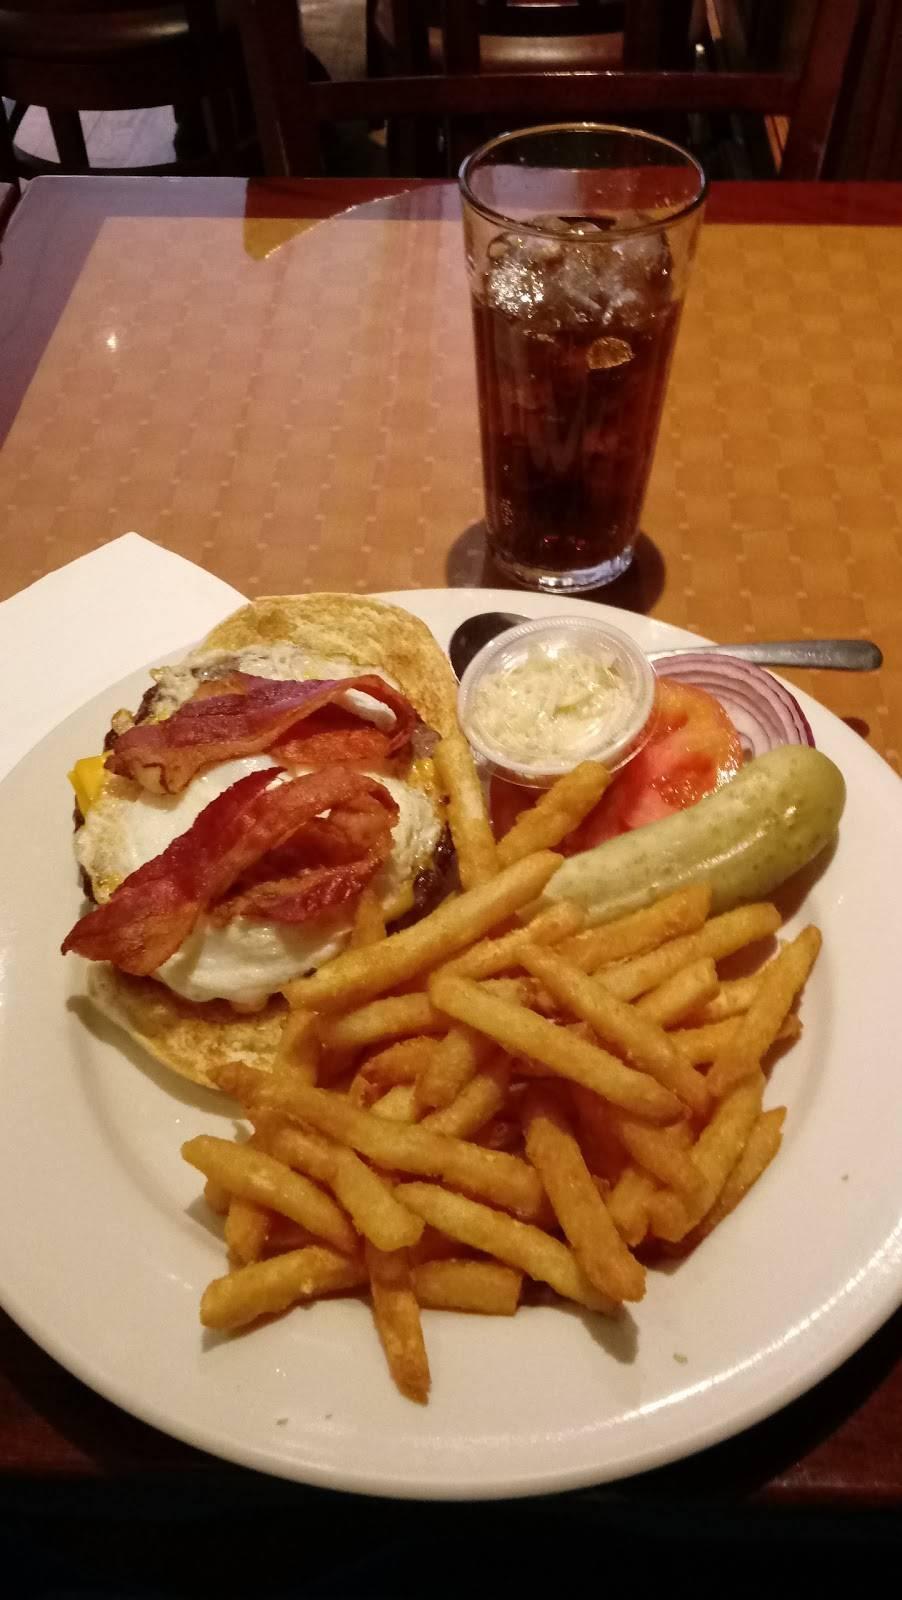 Good Eats Charcoal Grill | restaurant | 7002 Broadway, Guttenberg, NJ 07093, USA | 2016622123 OR +1 201-662-2123